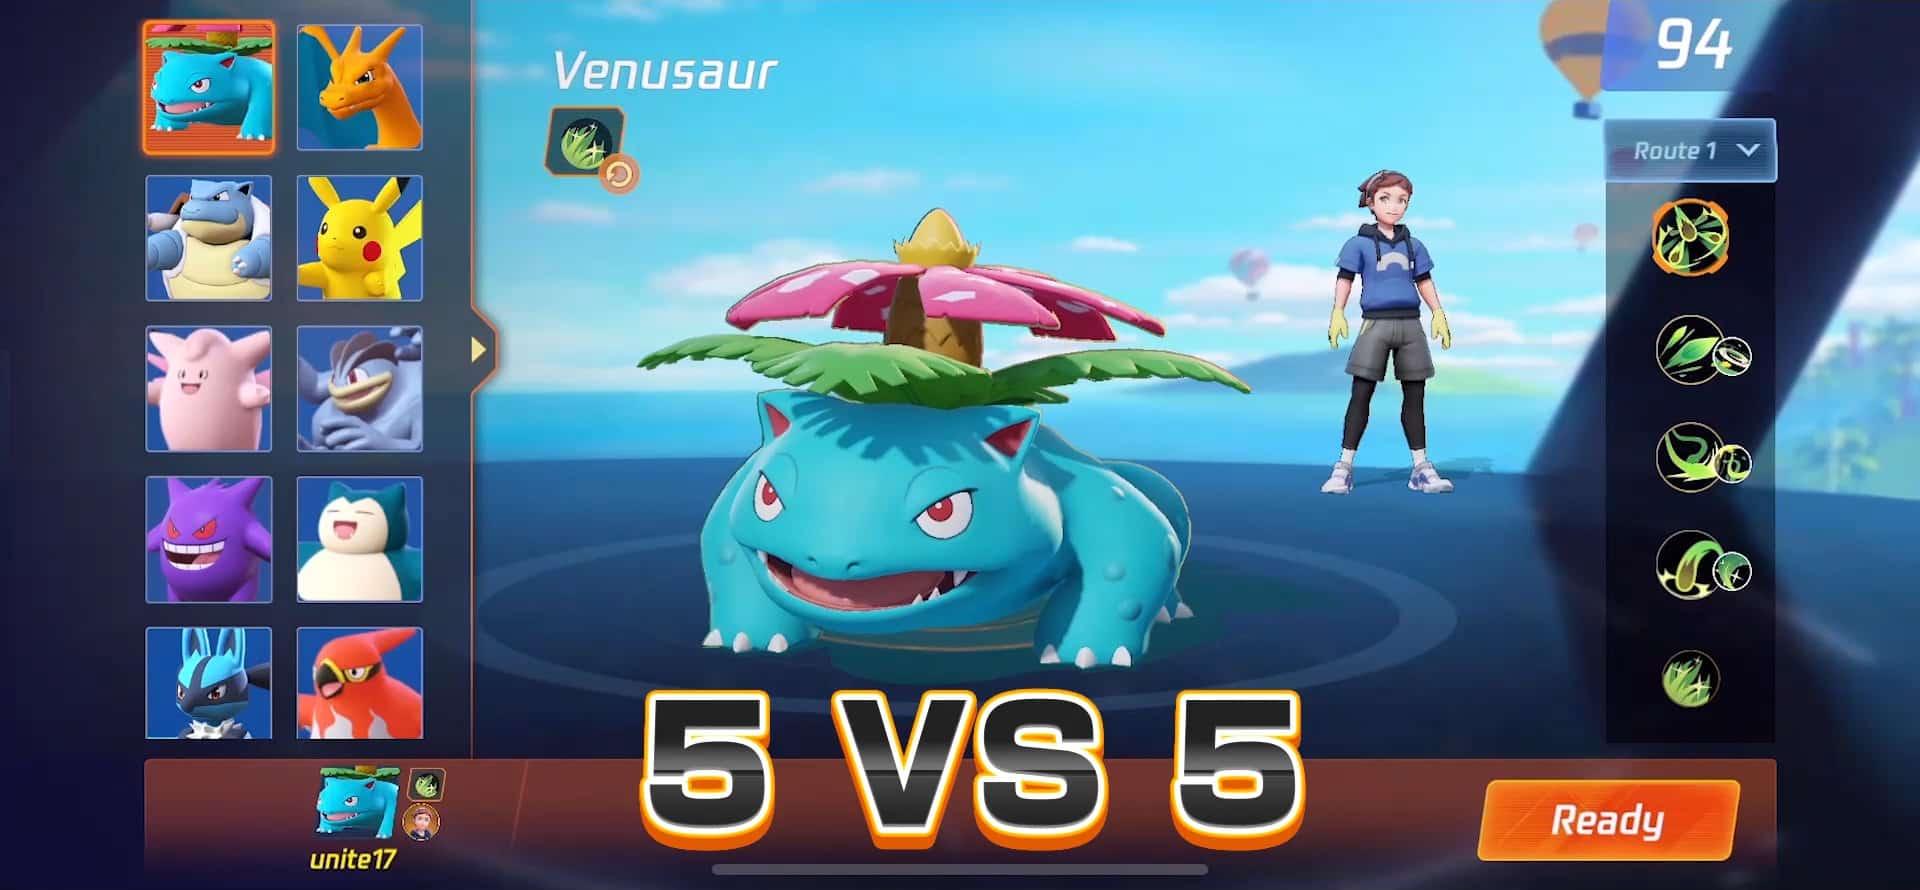 Pokémon Unite, Pokémon Presents, Tencent, MOBA, TiMi Studios,